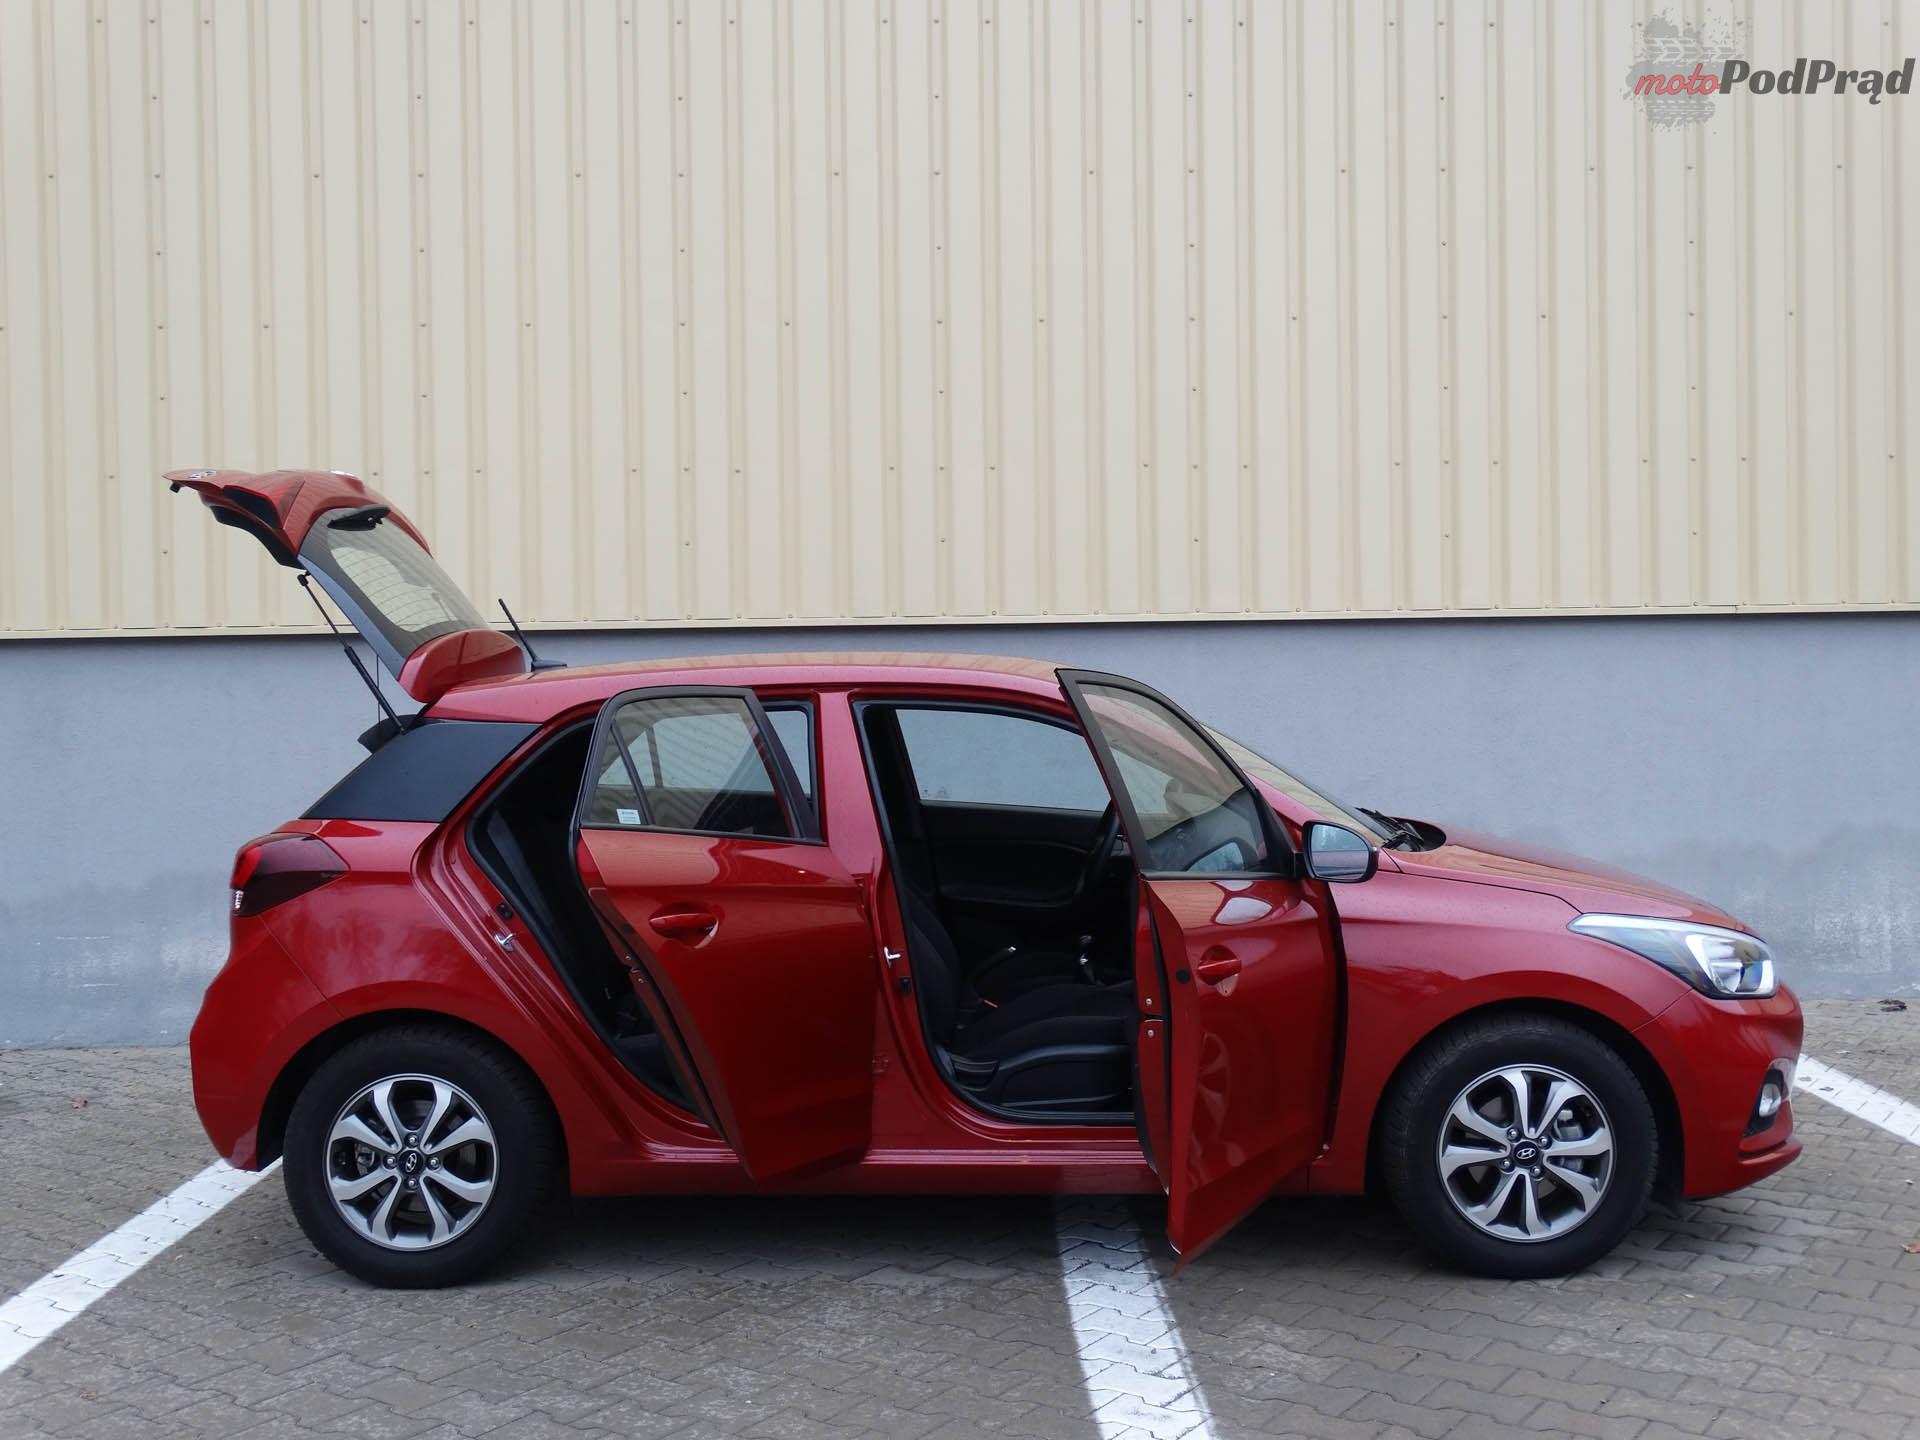 hyundai i20 2 Test: Hyundai i20 1.2 MPI 84 KM   nie tylko miejski